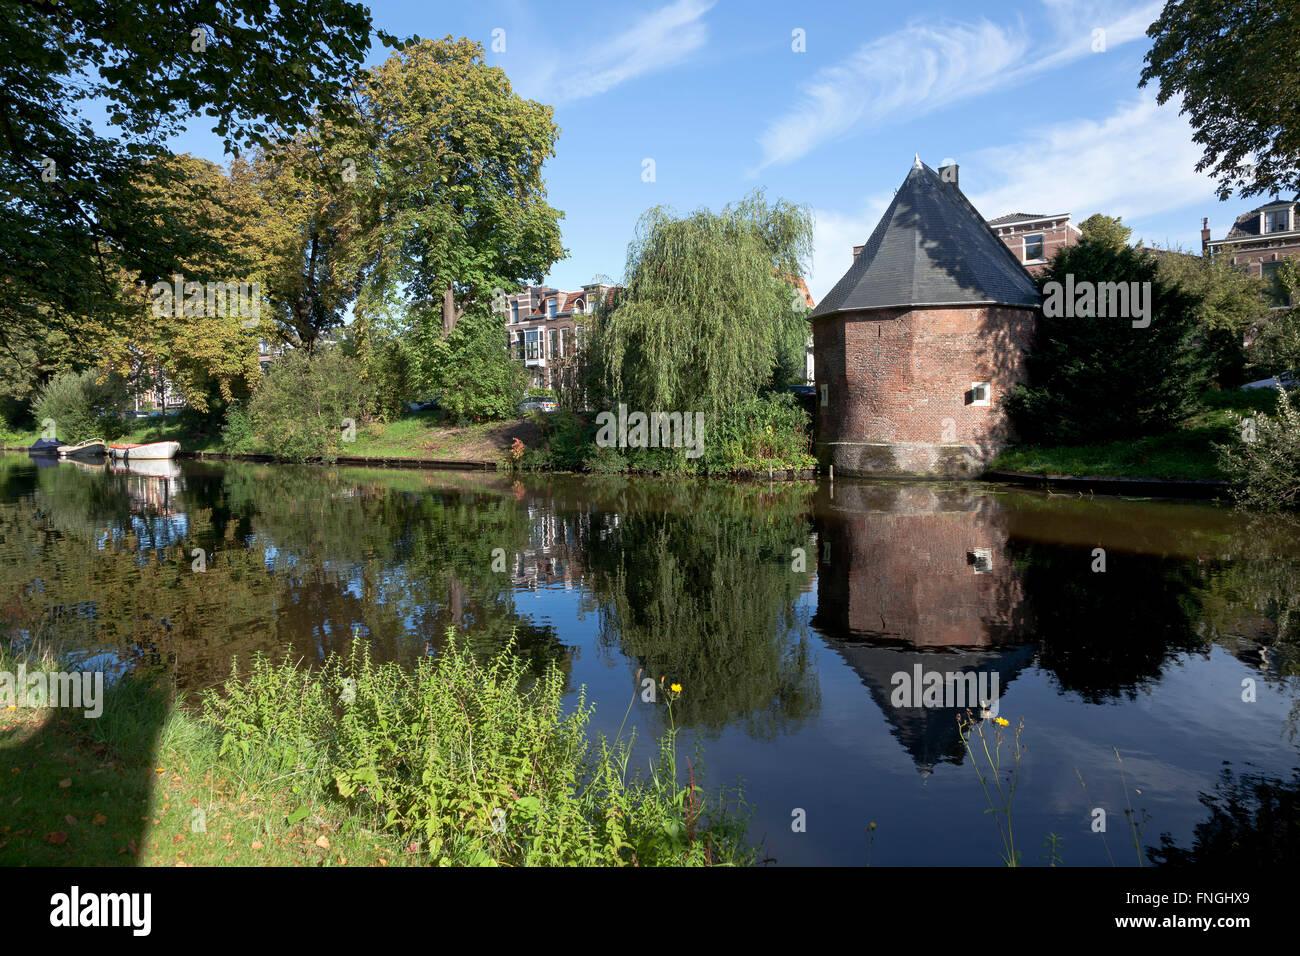 Ammunition Magazine in the city of Leiden - Stock Image